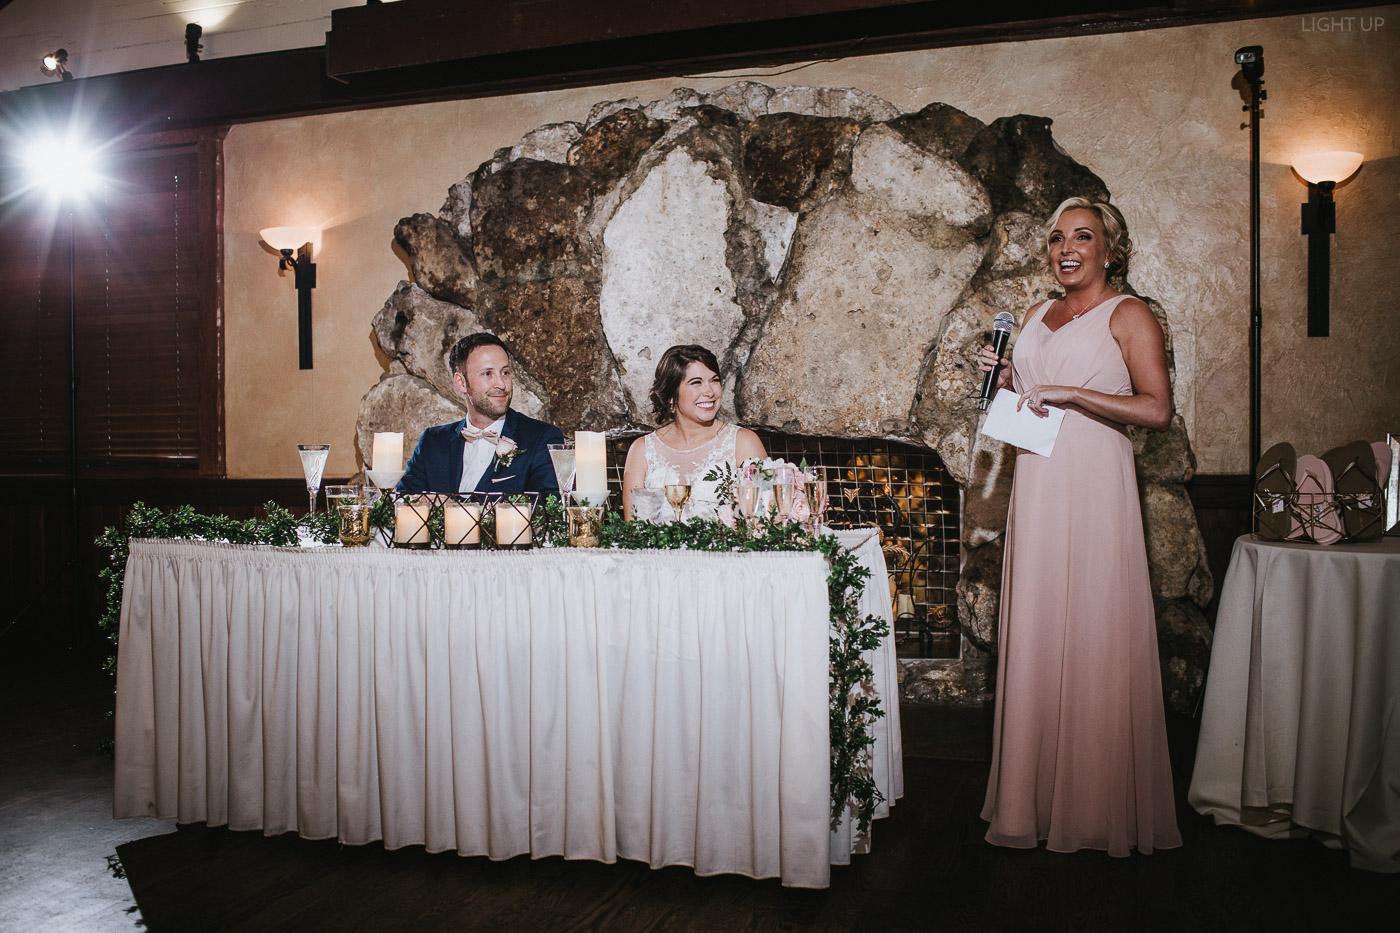 hstoric-dubsdread-wedding-orlando-46.jpg